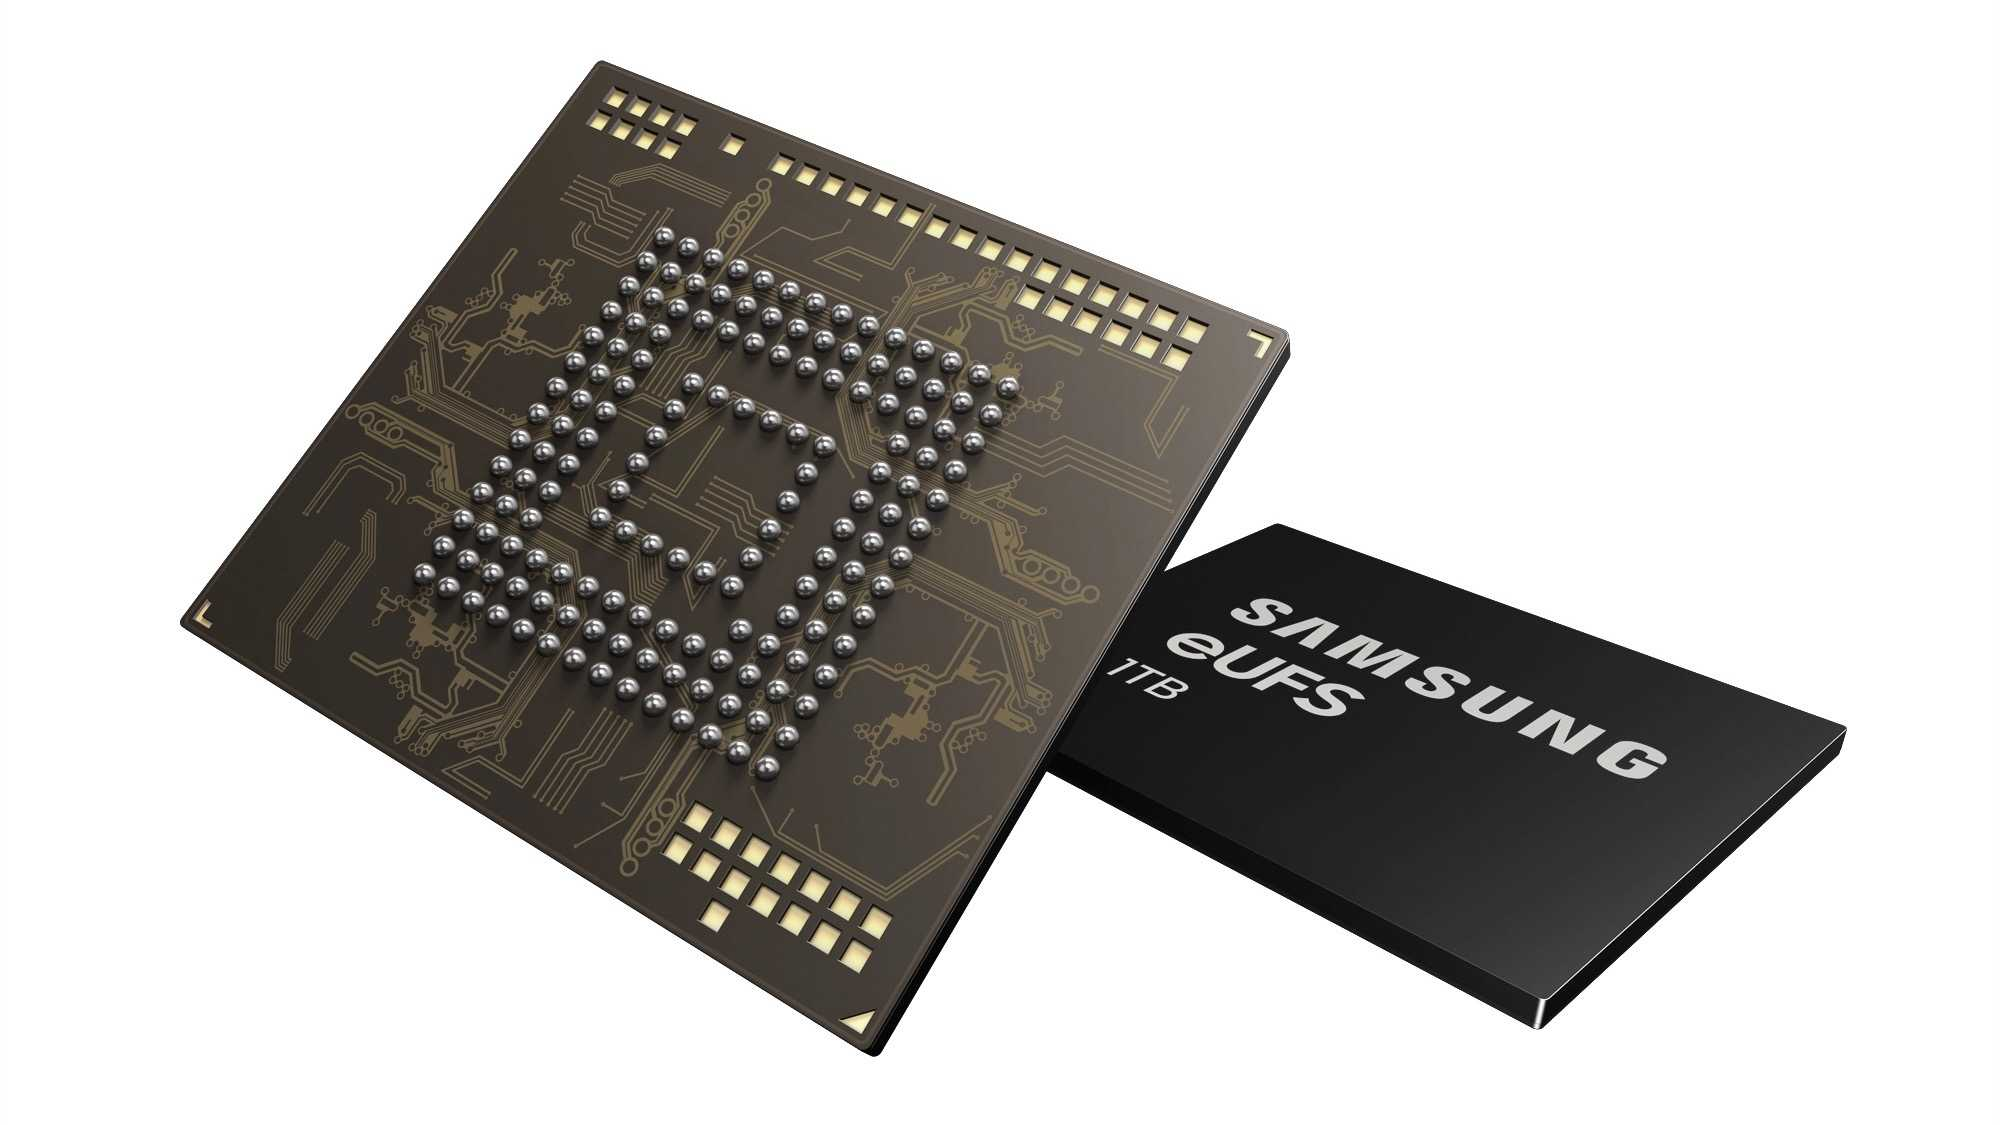 Samsung eUFS 2.1 1 TByte